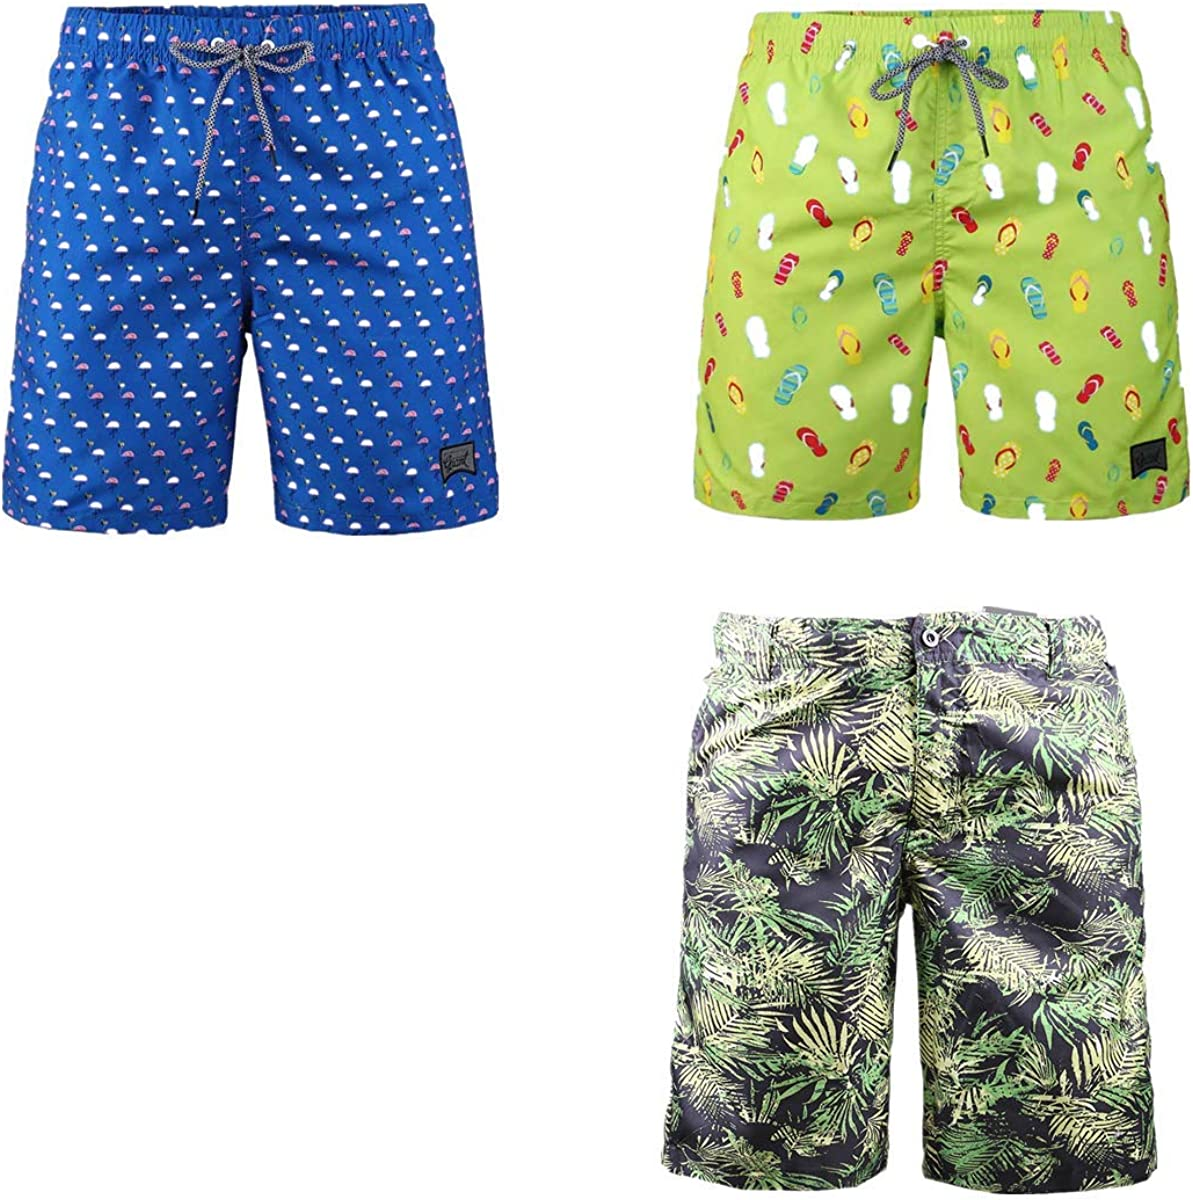 Beautiful Giant Cheap 3-Pack Men's Elastic Miami Mall Board Casual S Shorts Waist